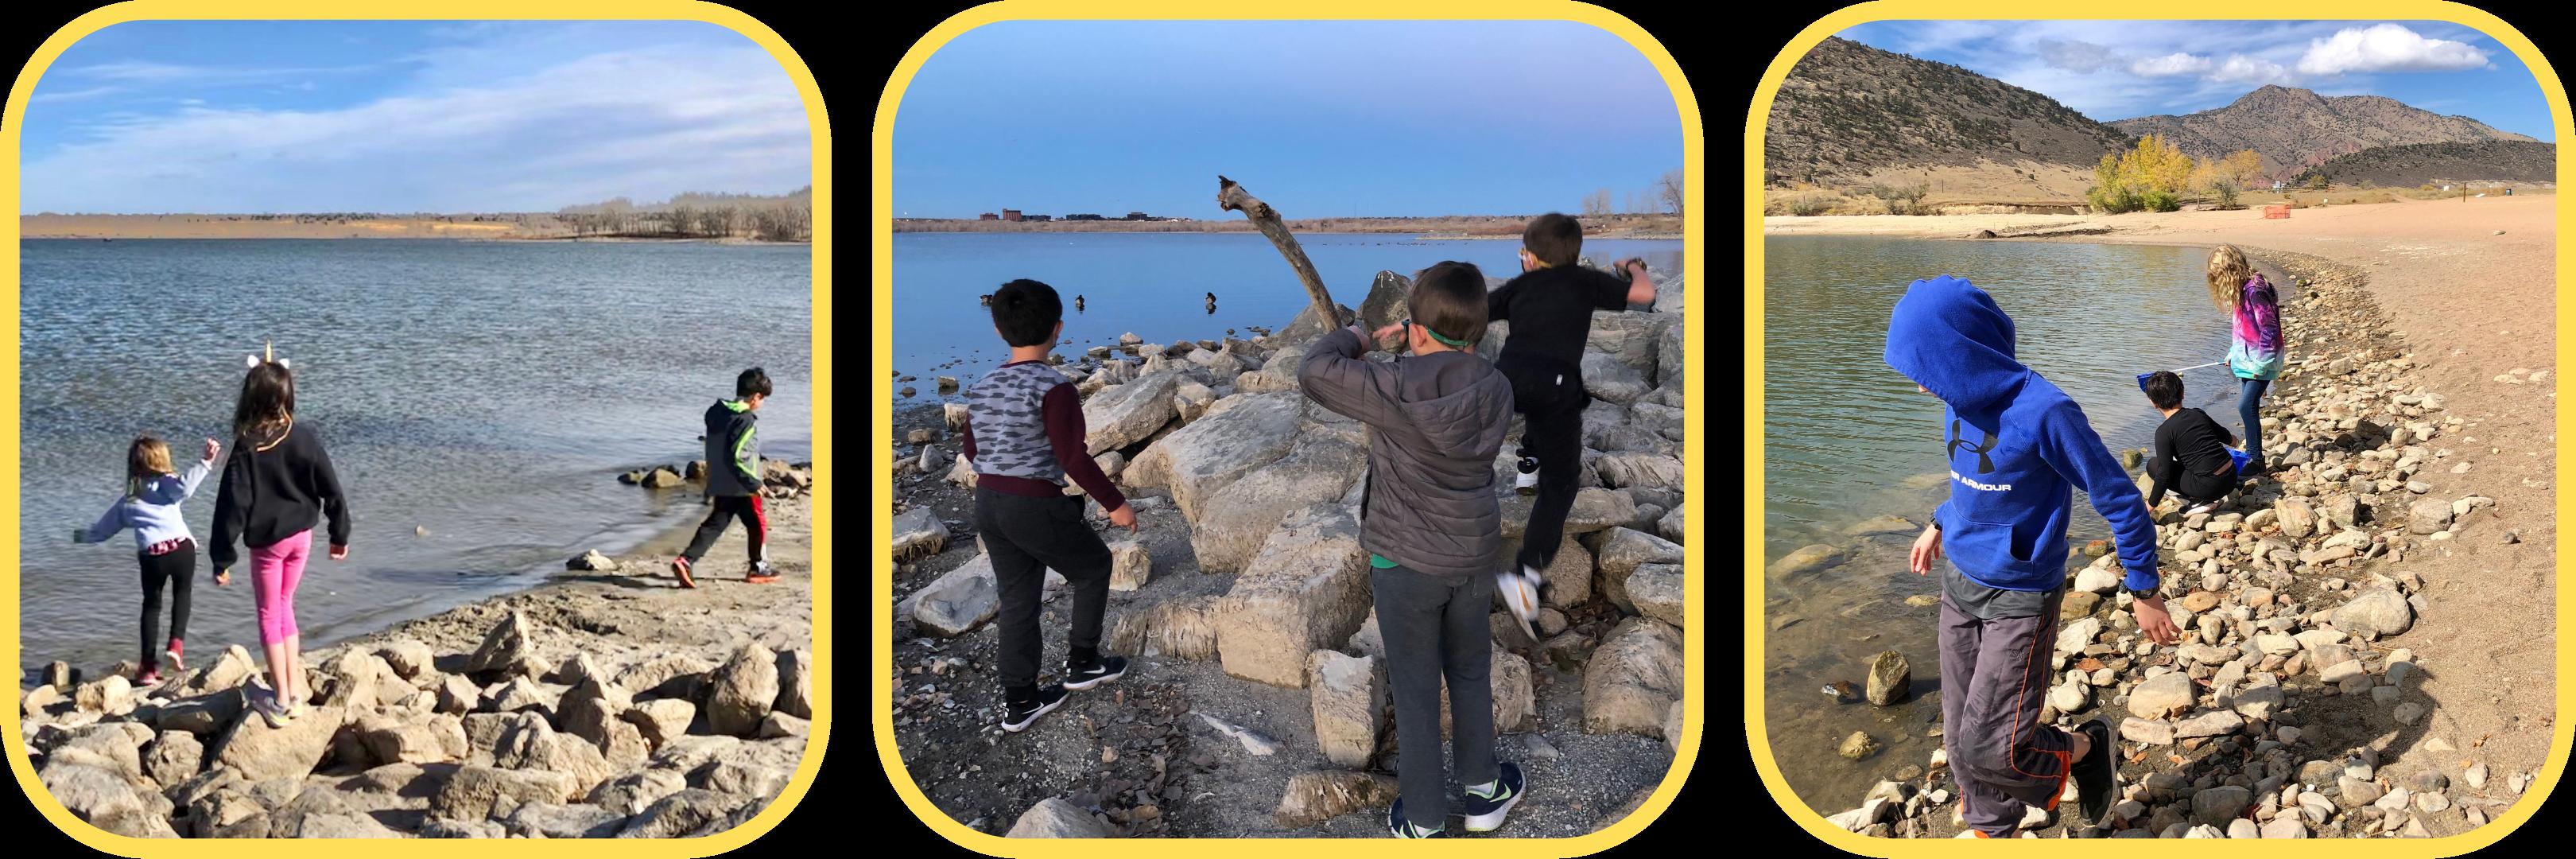 denver-tour-club-school-year-adventures-day-camp-kids-outdoor-adventures-2021-2-.png